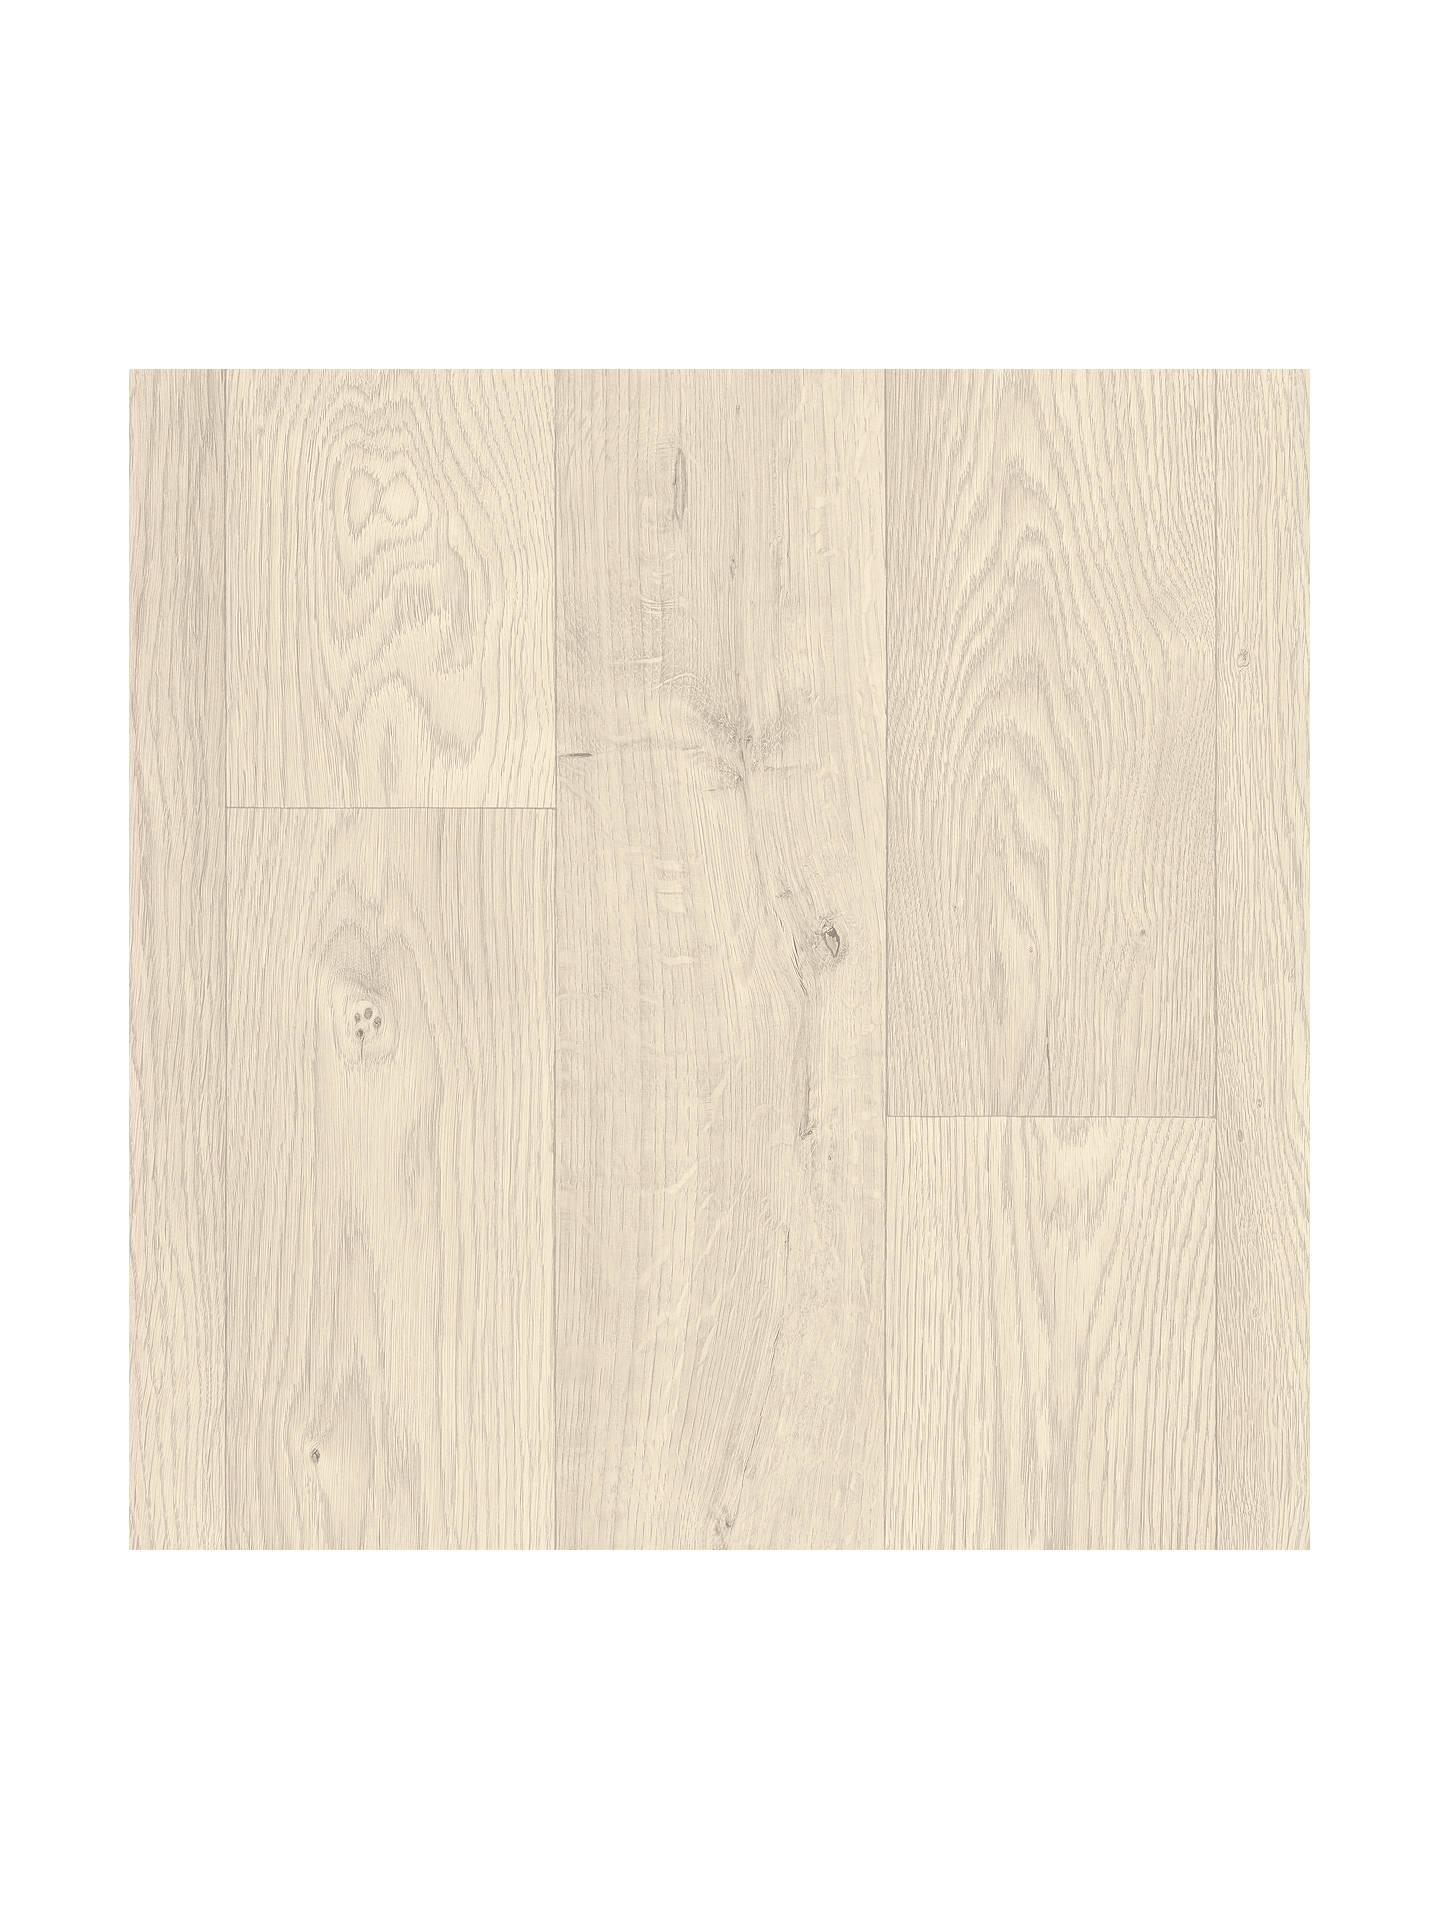 john lewis partners wood elite 15 vinyl flooring at john lewis partners. Black Bedroom Furniture Sets. Home Design Ideas